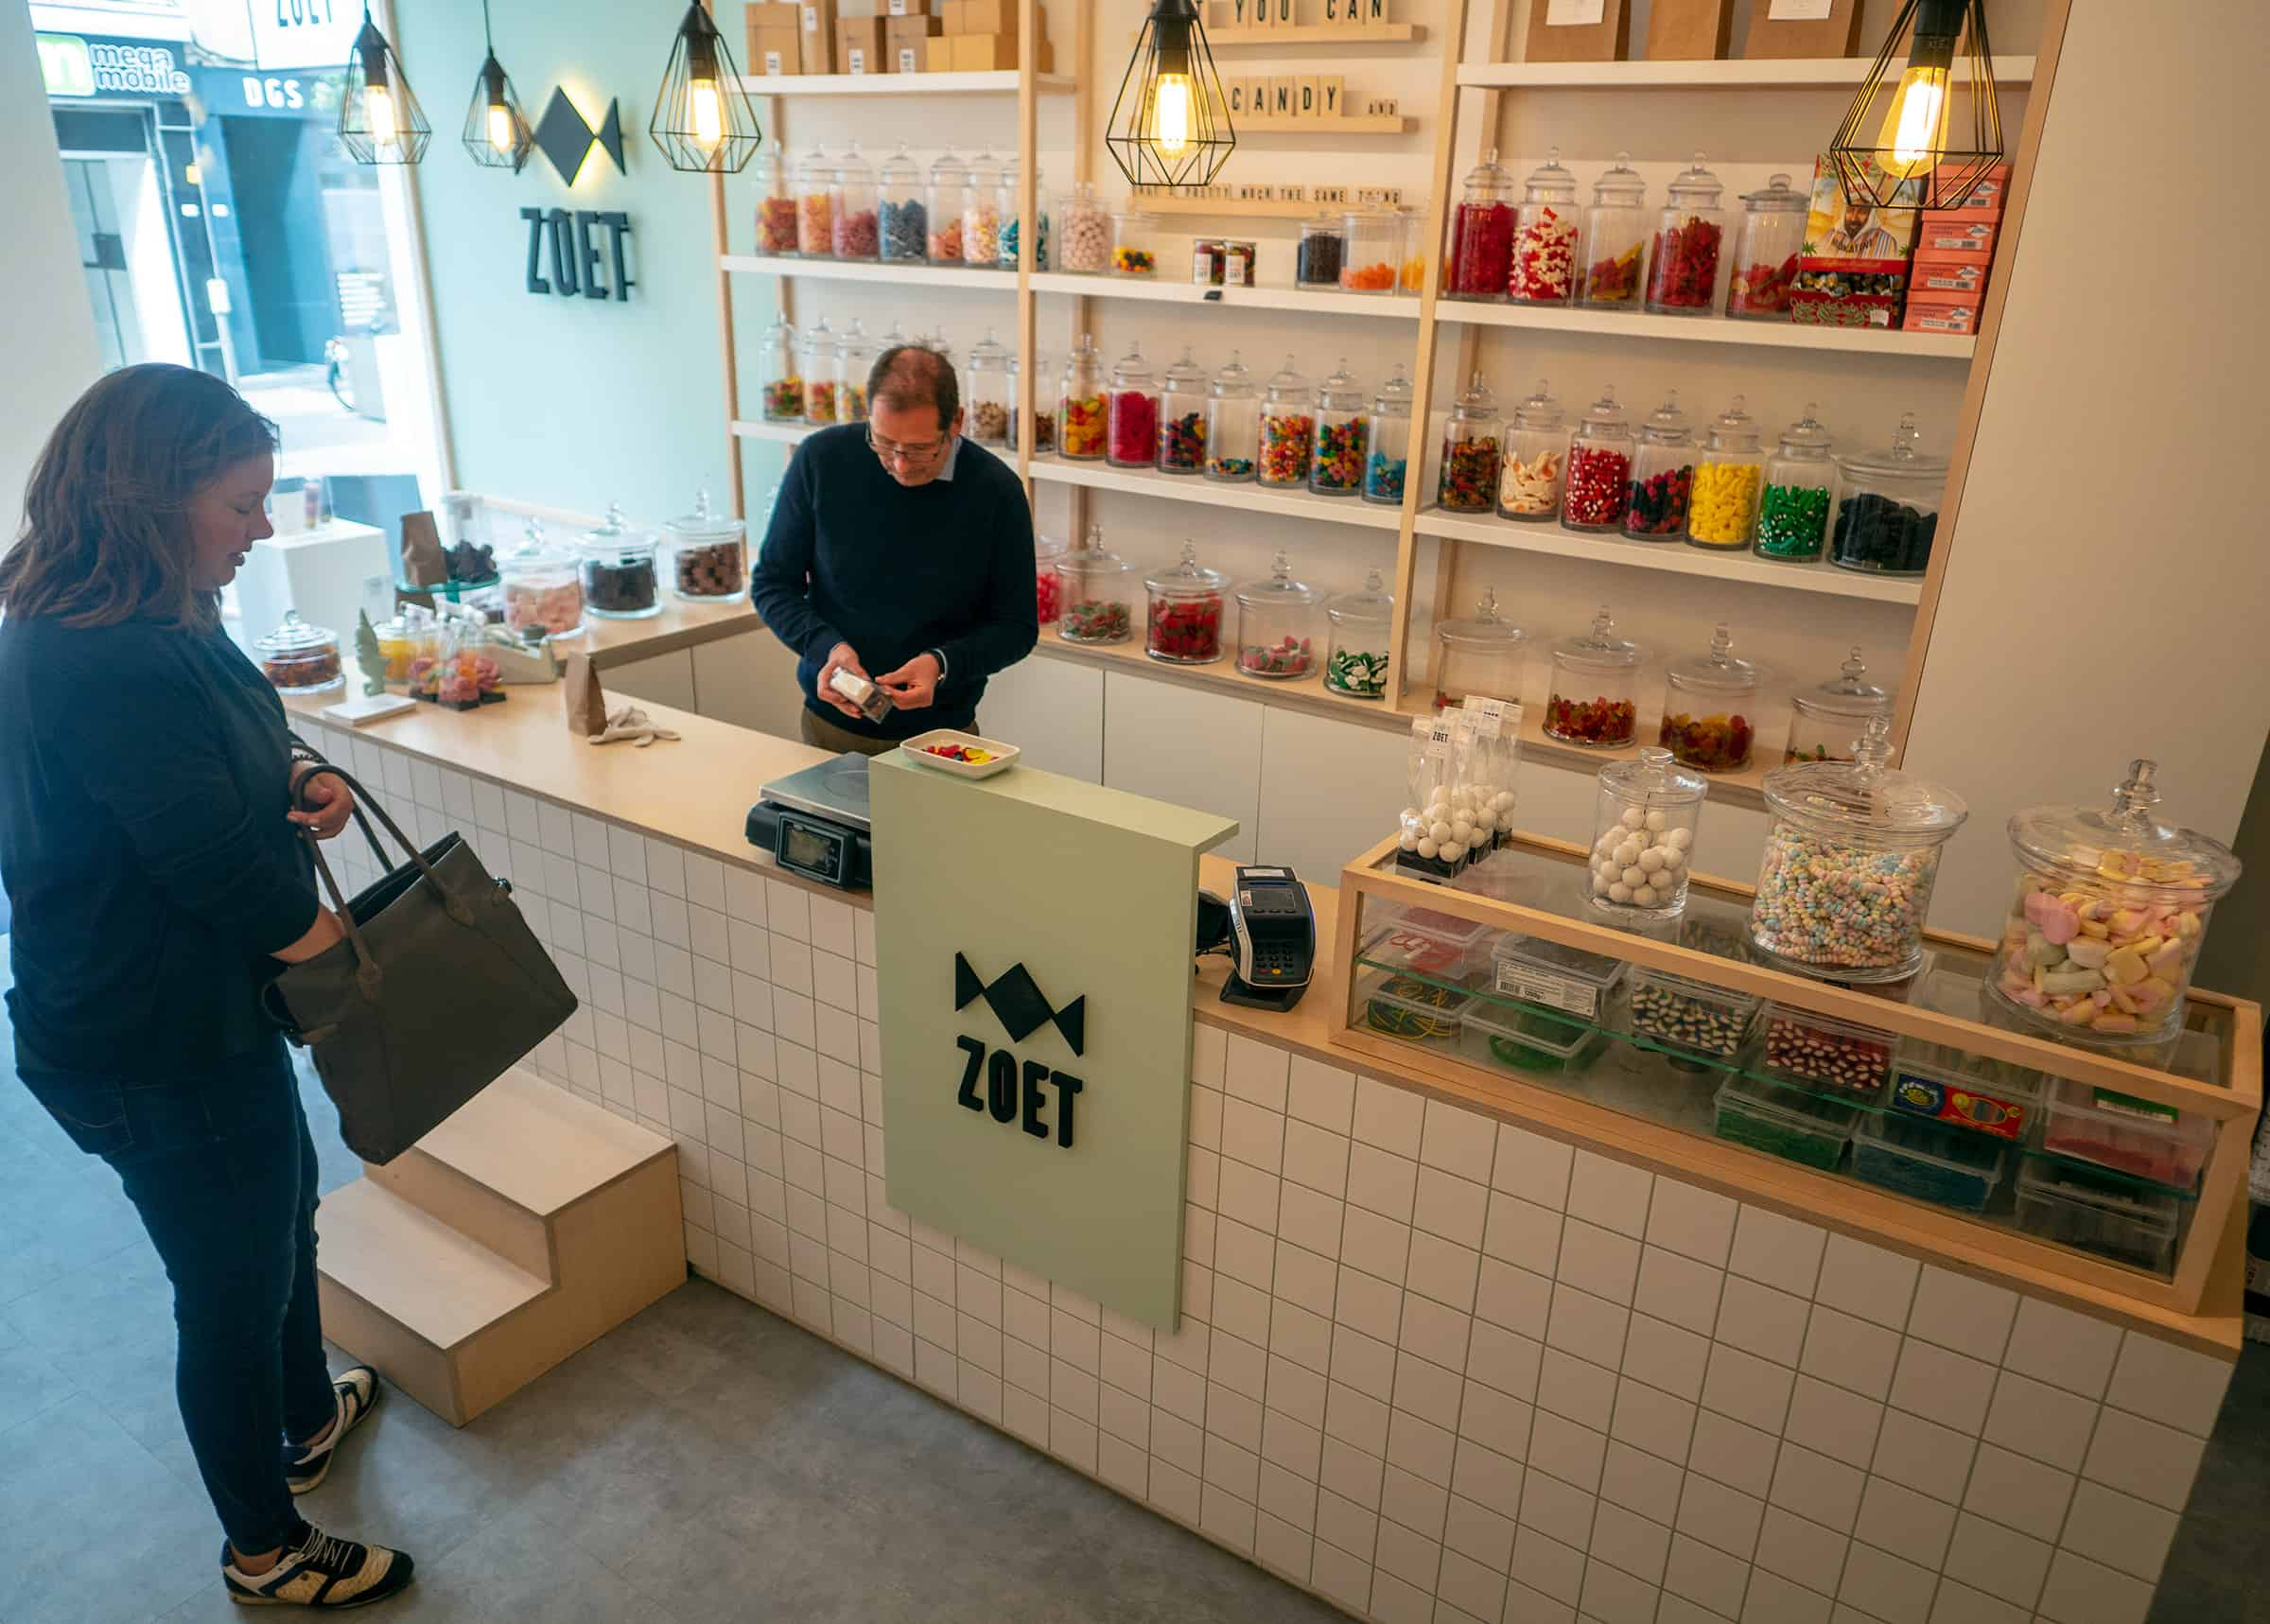 Zoet snoepwinkel Mechelen